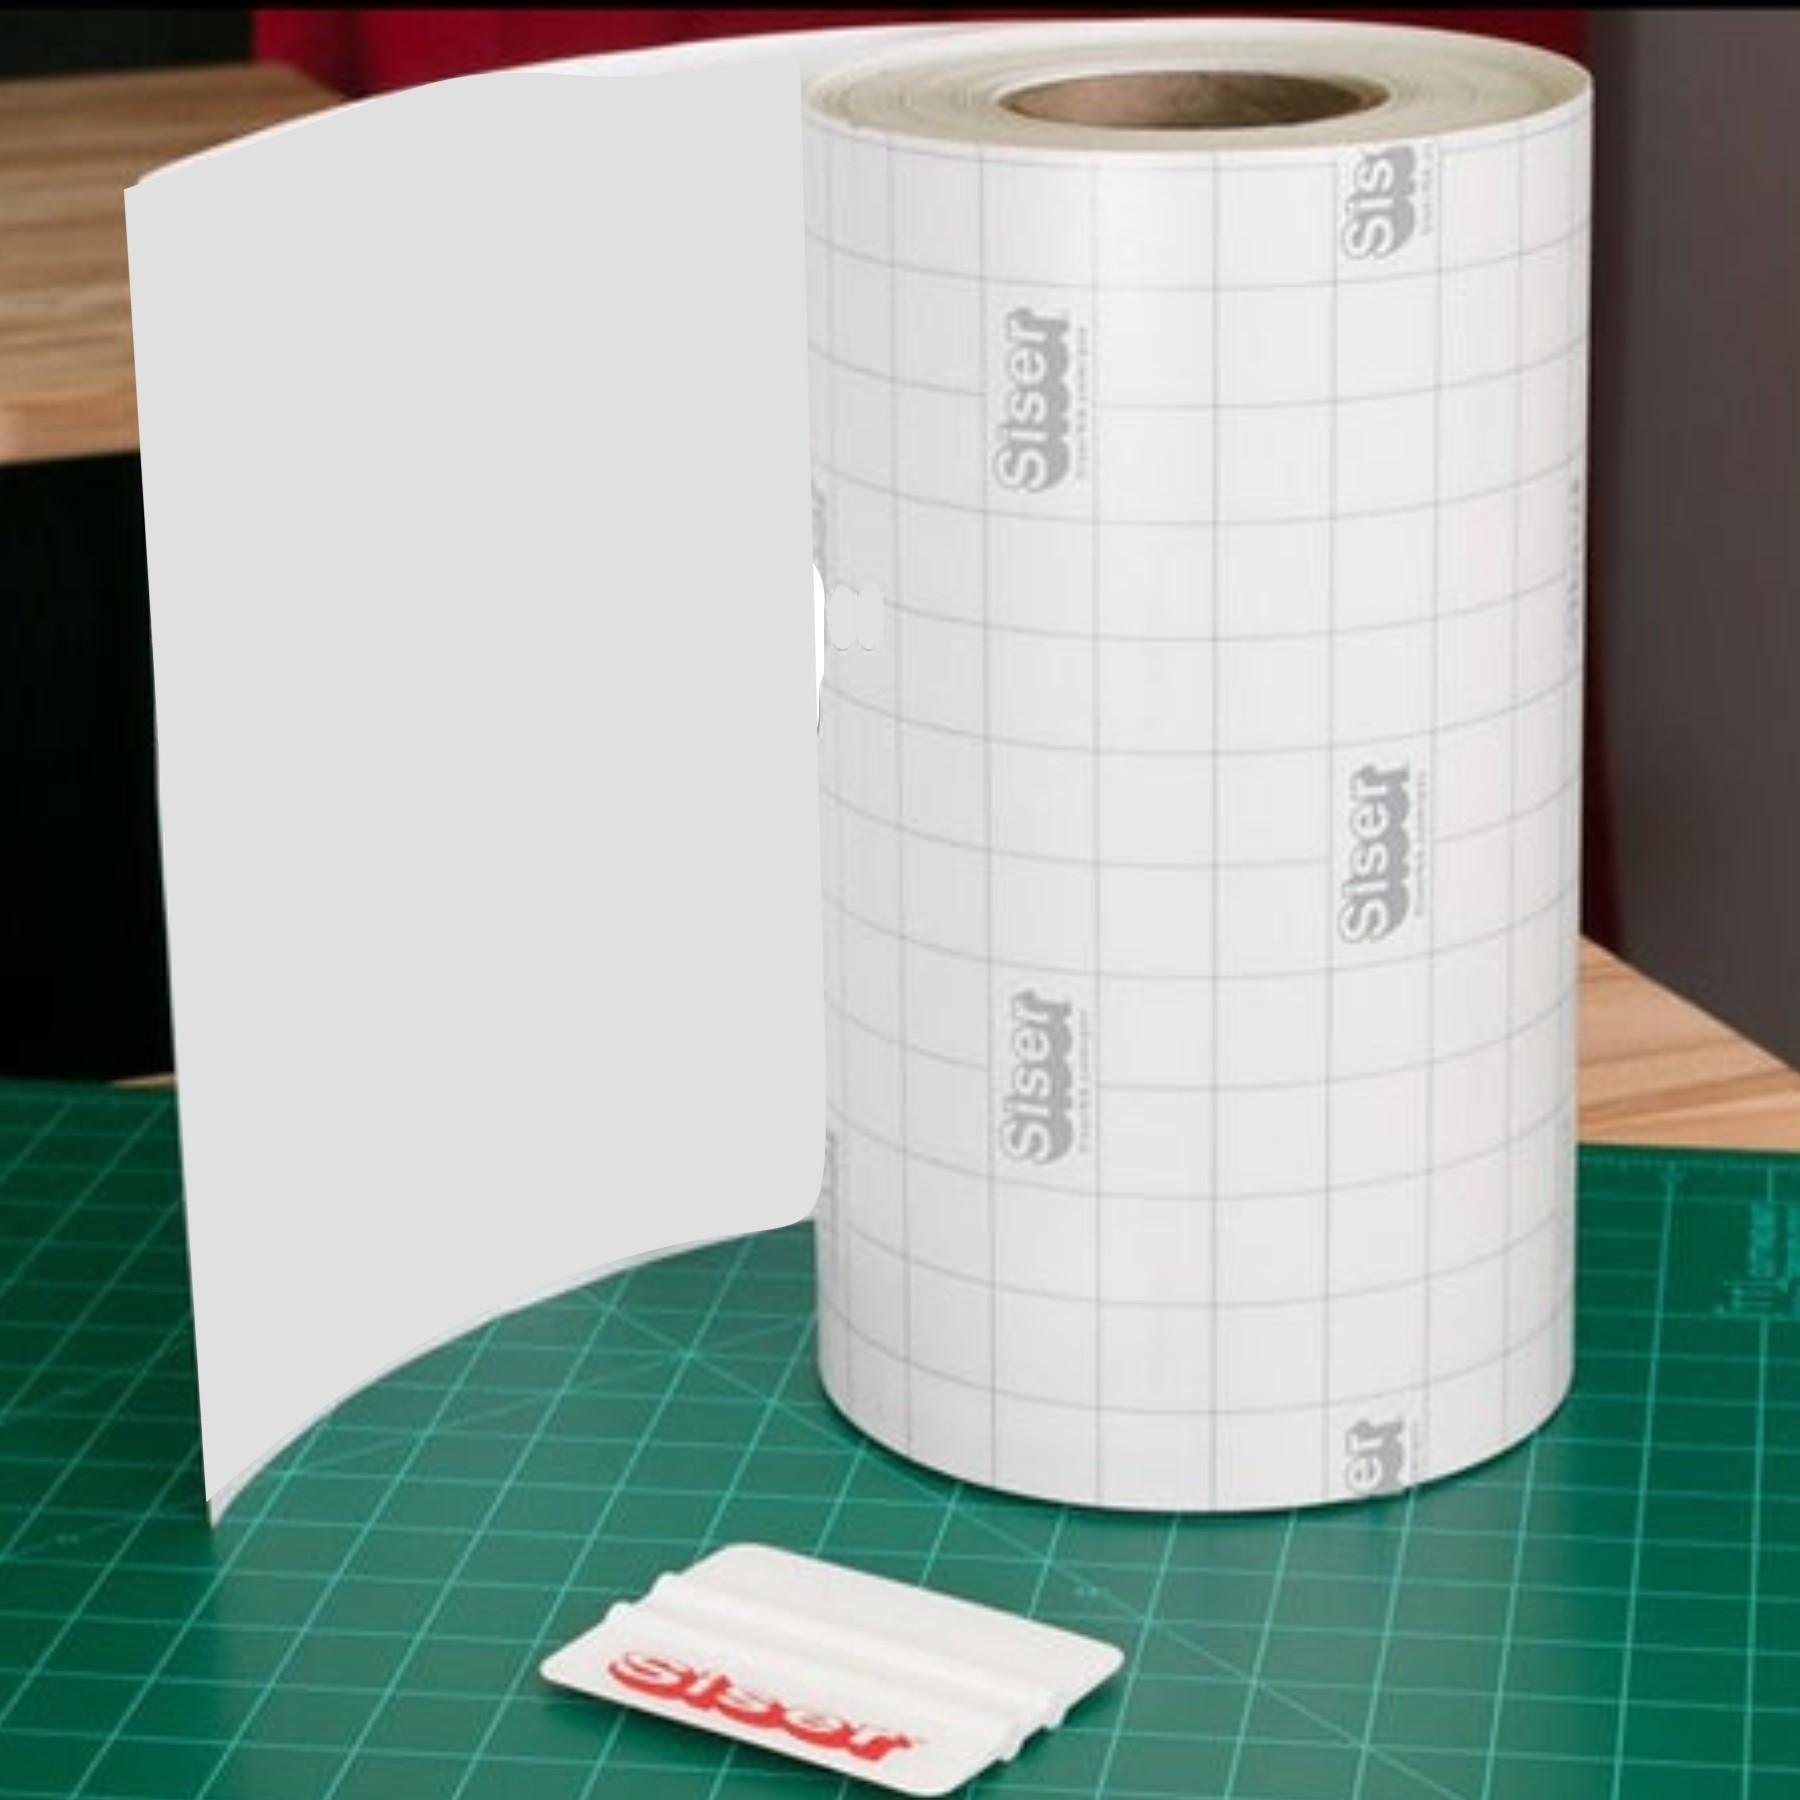 Transfer para vinilos Siser, rollo 30 cm x 45 metros